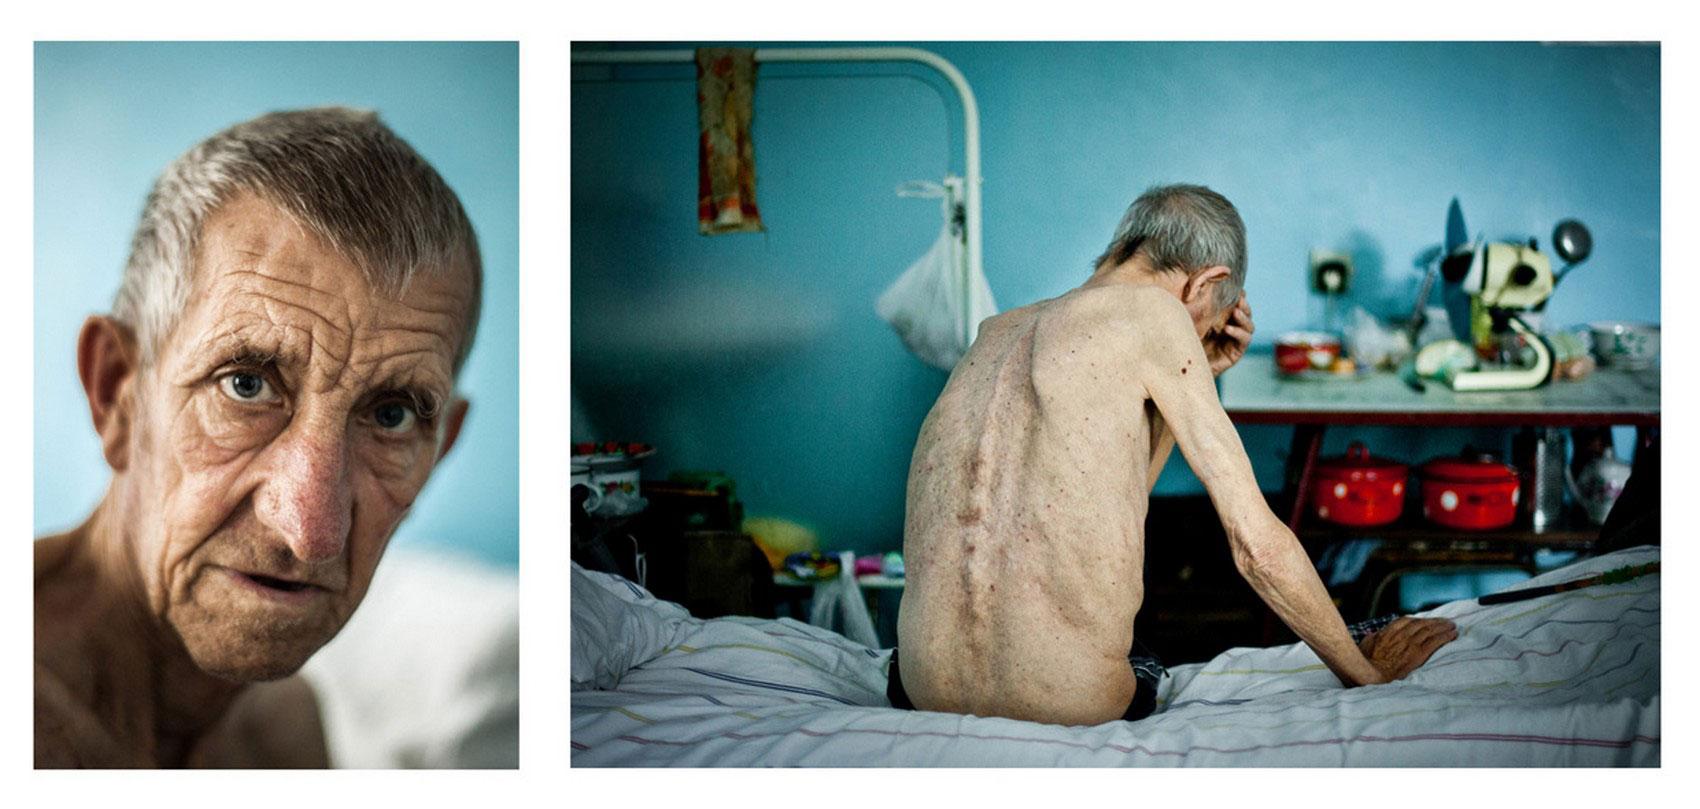 мужчина болеет туберкулезом, фотоконкурс